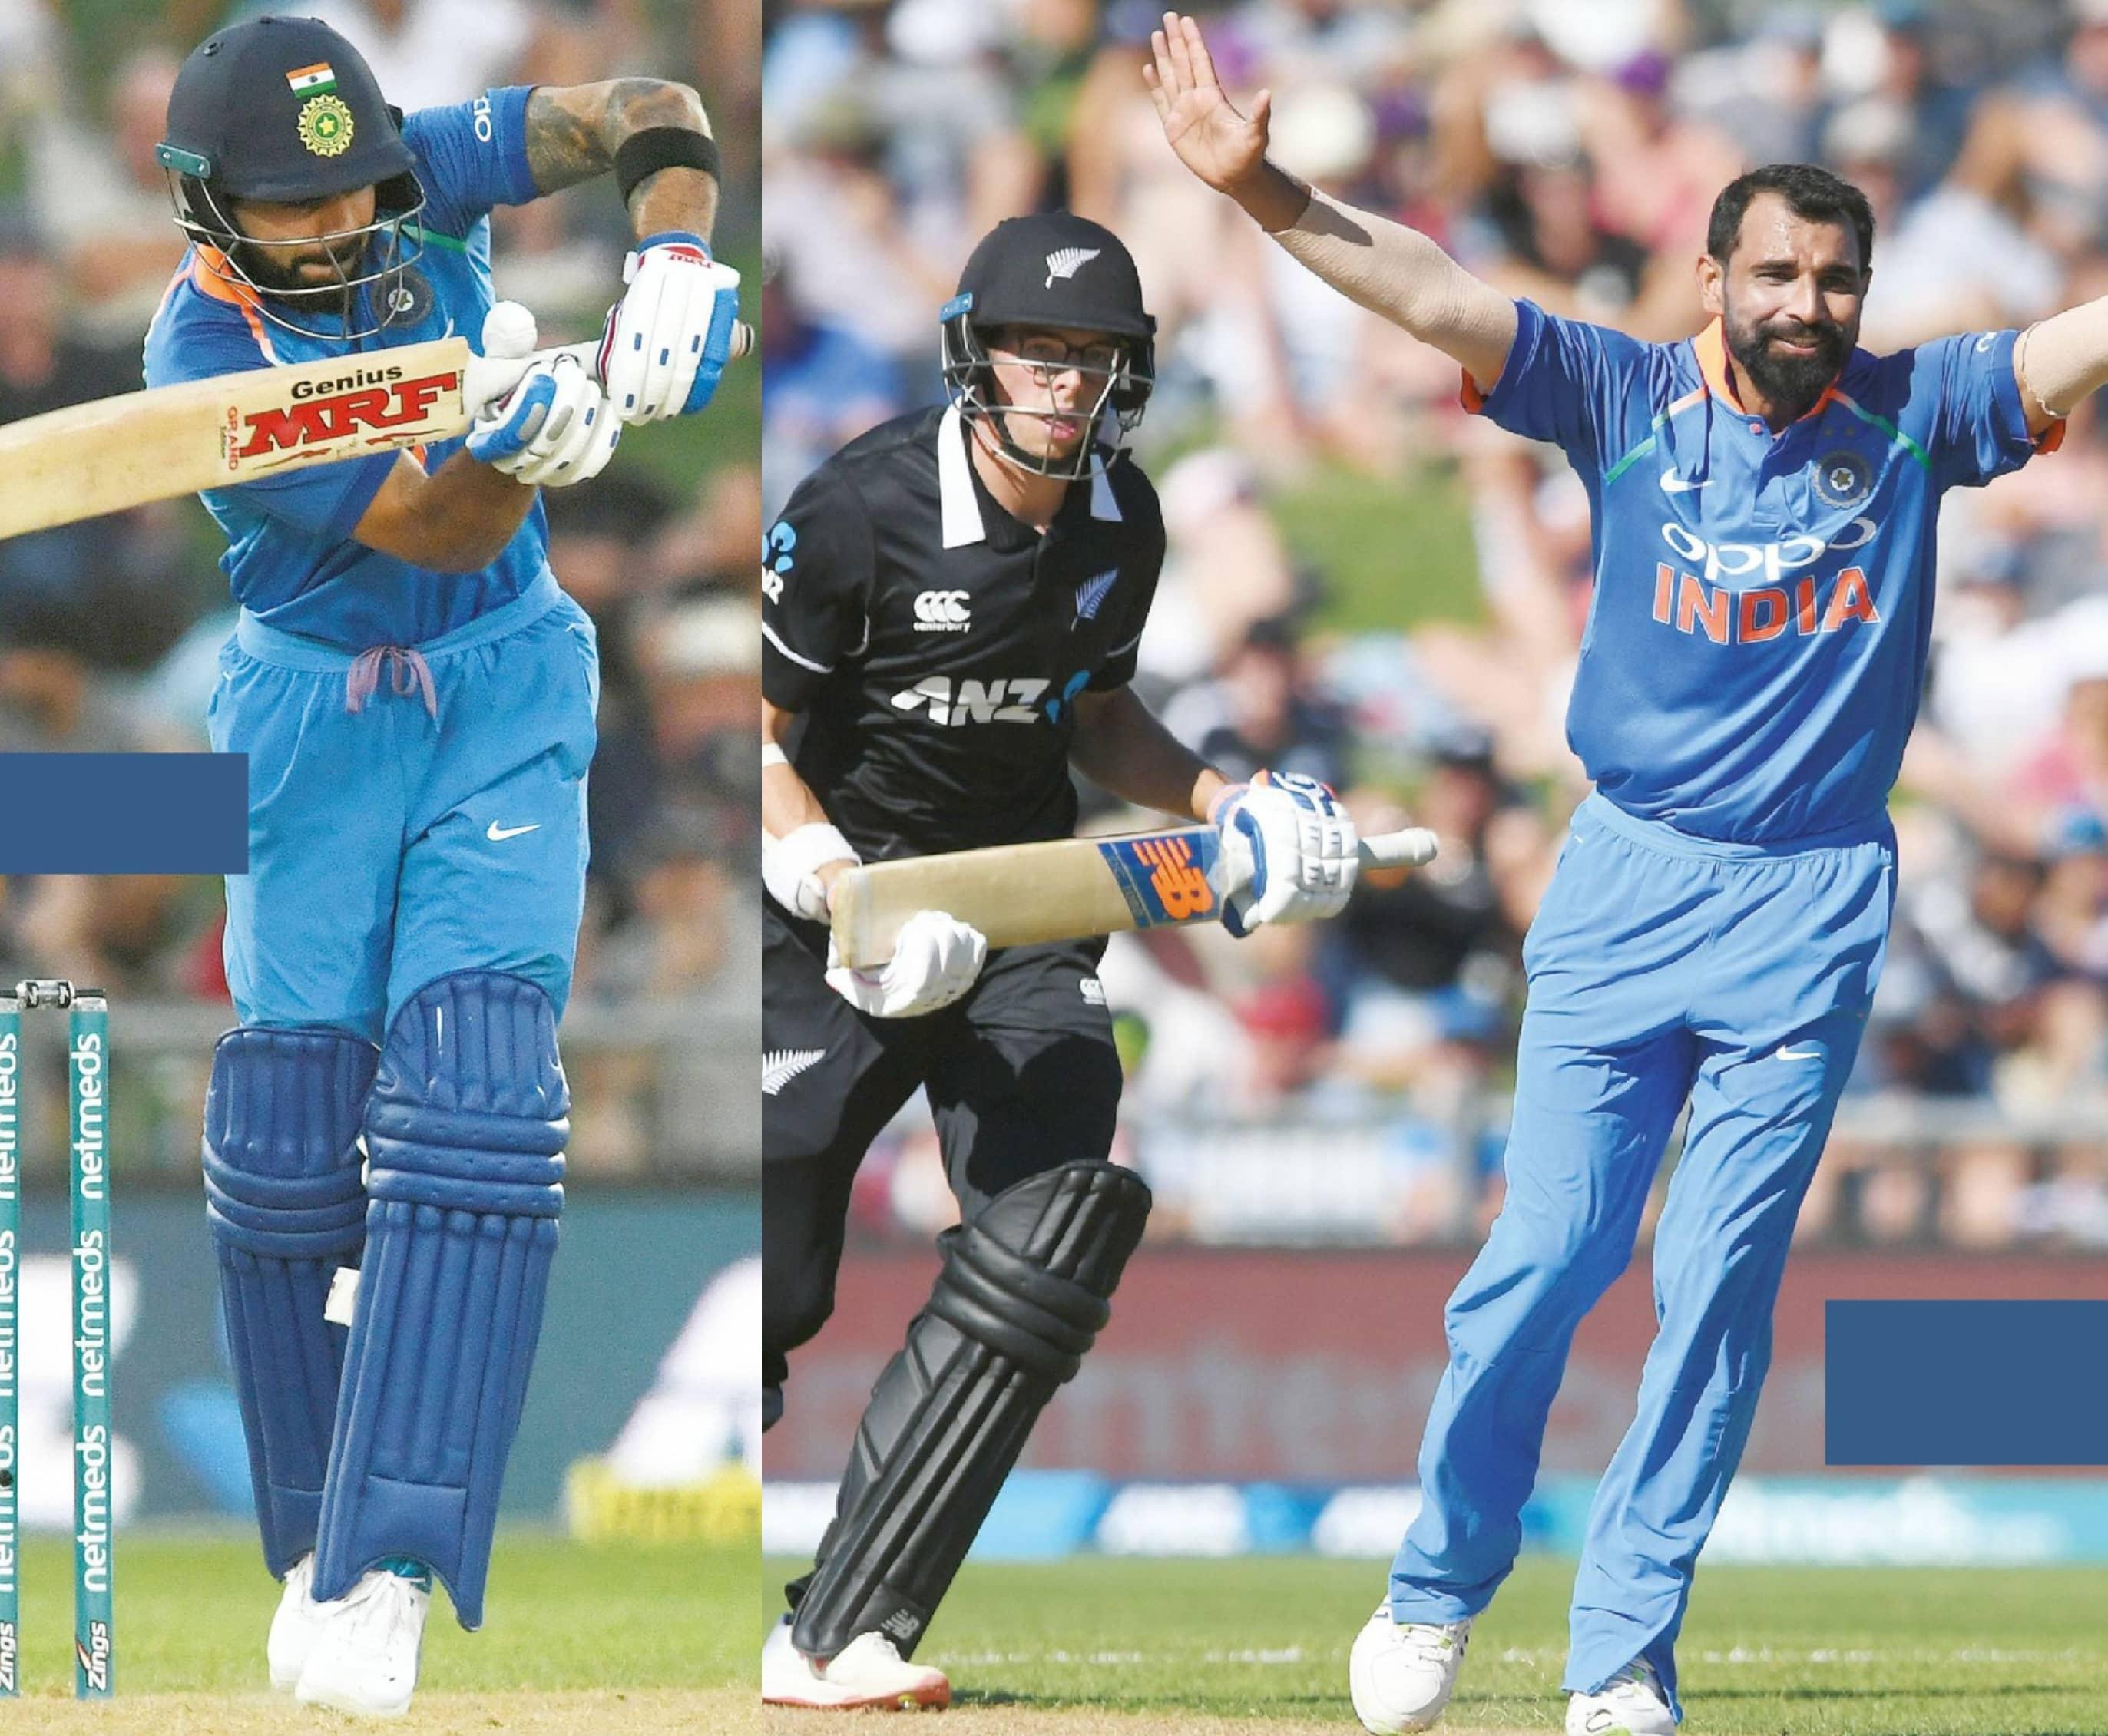 Dominant India Batter Black Caps and earn Kohli A Timley Break